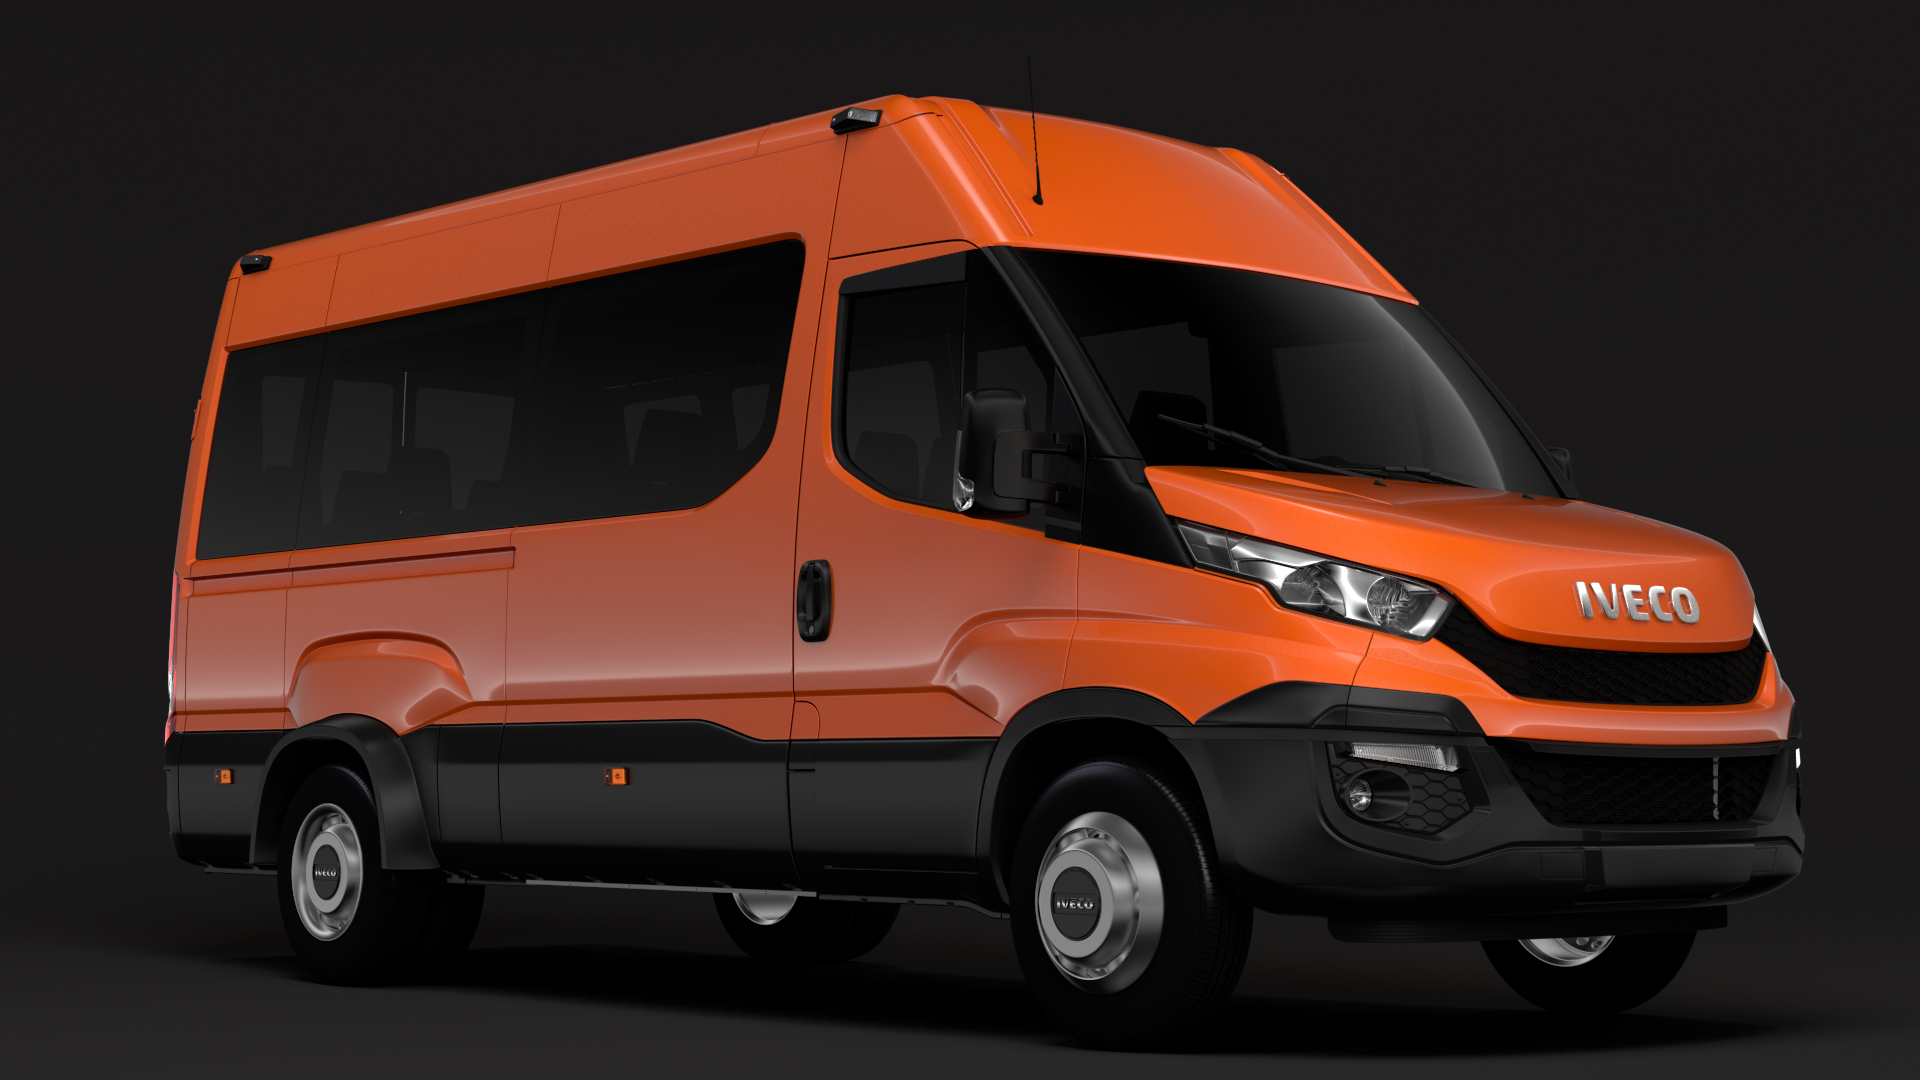 iveco daily minibus l3h2 2014-2016 3d model max fbx c4d lwo ma mb hrc xsi obj 276043